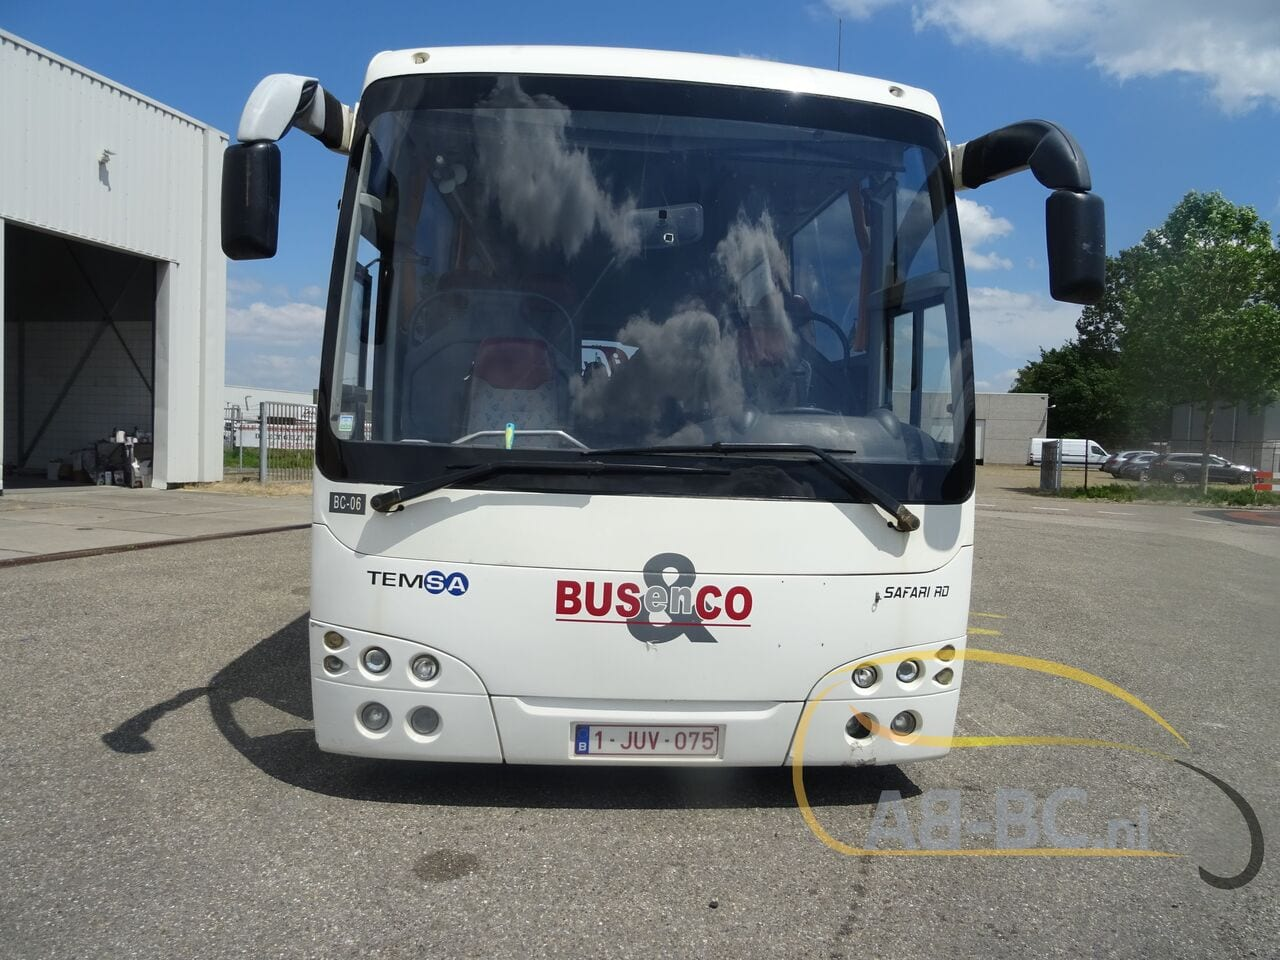 coach-busTEMSA-Safari-RD-DAF-Motor-53-Seats-Euro-5---1623932797553098238_big_e1090e9bf57146c5a4da1359bc1a6d1f--21061715155620919600